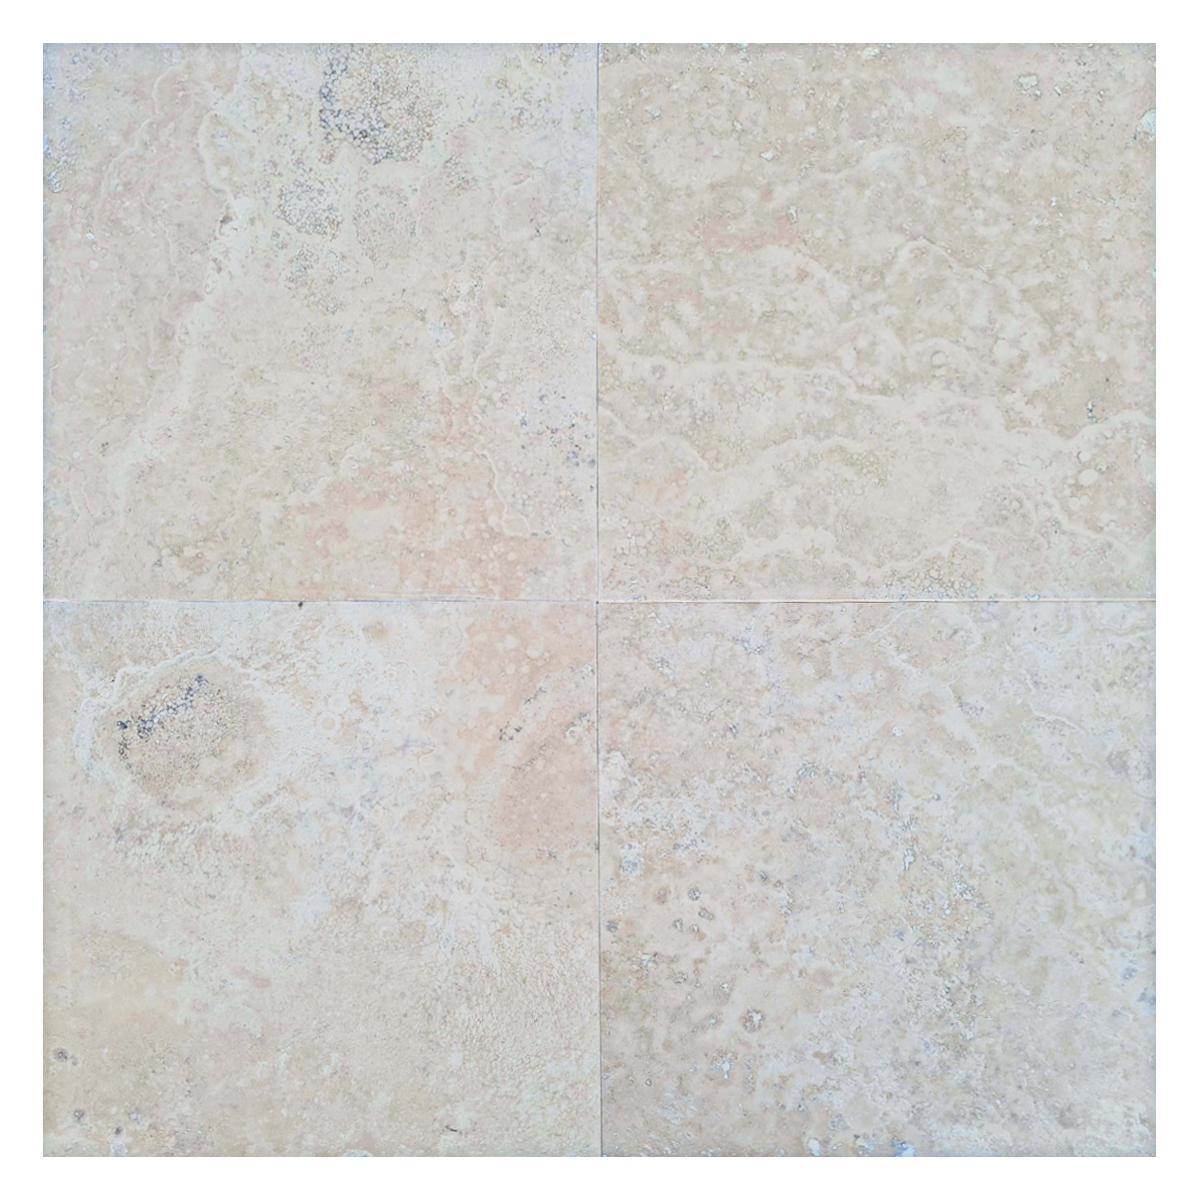 Mármol Travertino Paracas Crema Brillante - 60.9X60.9 cm - 1.11 m2